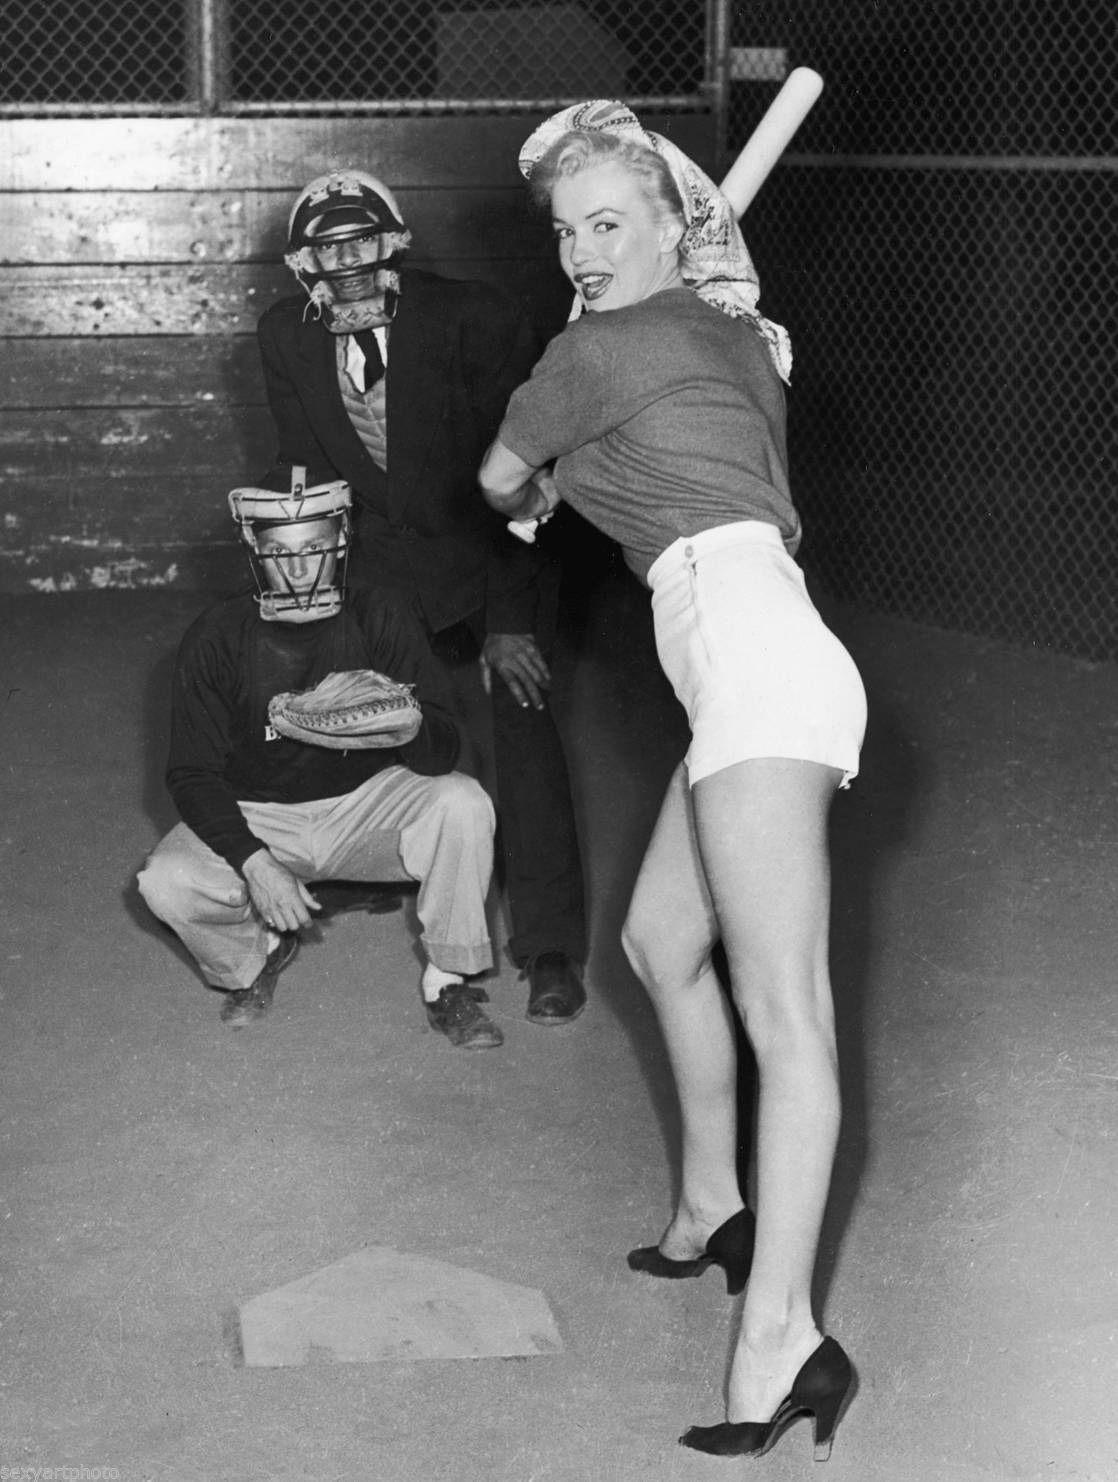 Marilyn Monroe Celebrity Vintage Classic Posing With Baseball Bat 8x10 Photo 9 Ebay Marilyn Monroe Photos Marilyn Monroe Marilyn